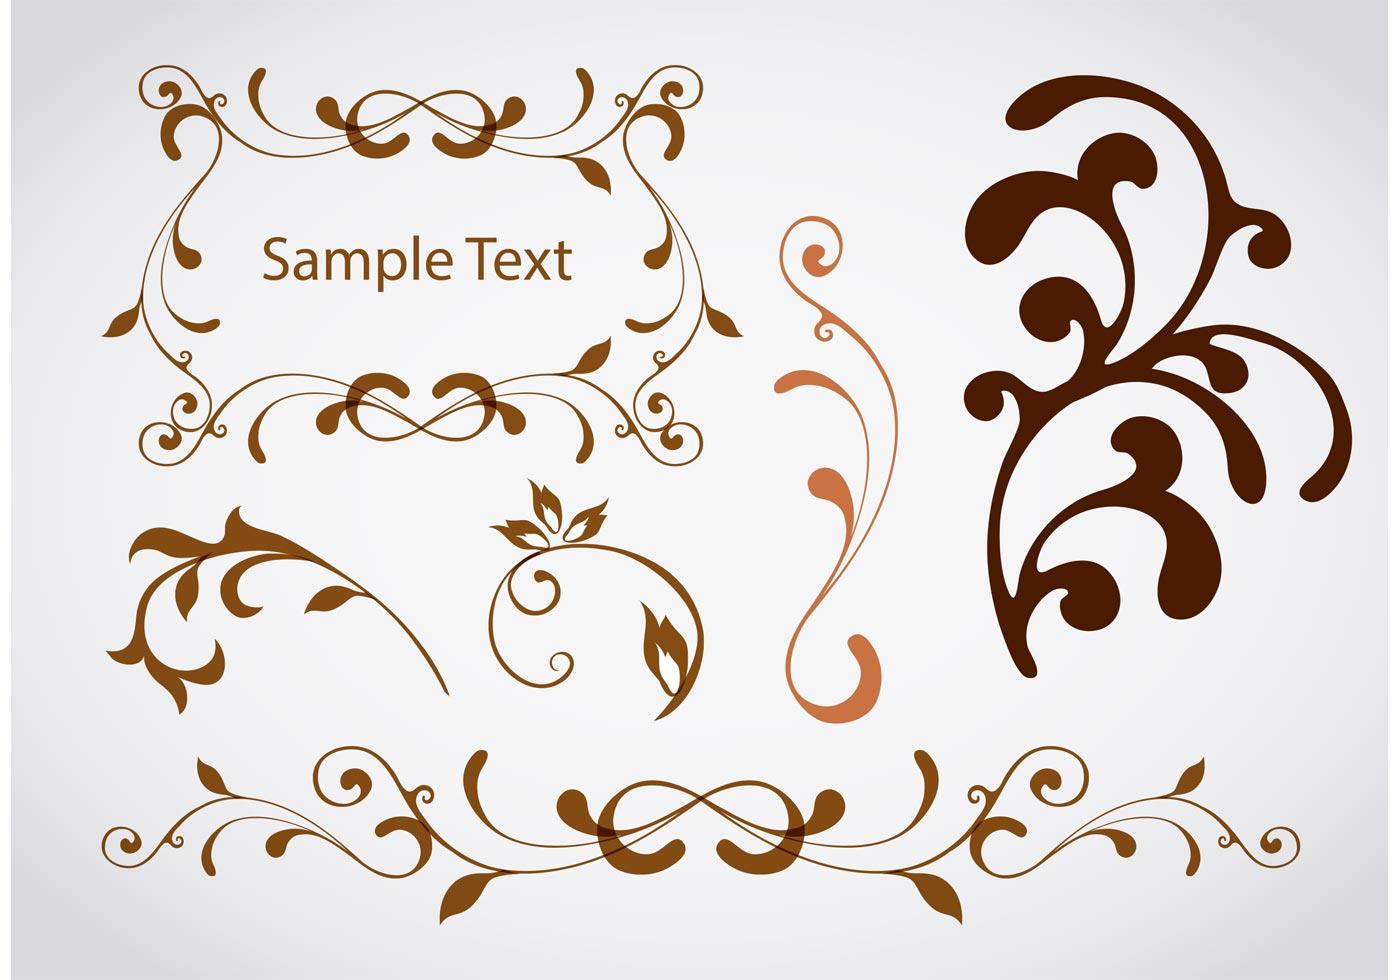 design swirl vector elements download free vector art stock graphics images. Black Bedroom Furniture Sets. Home Design Ideas